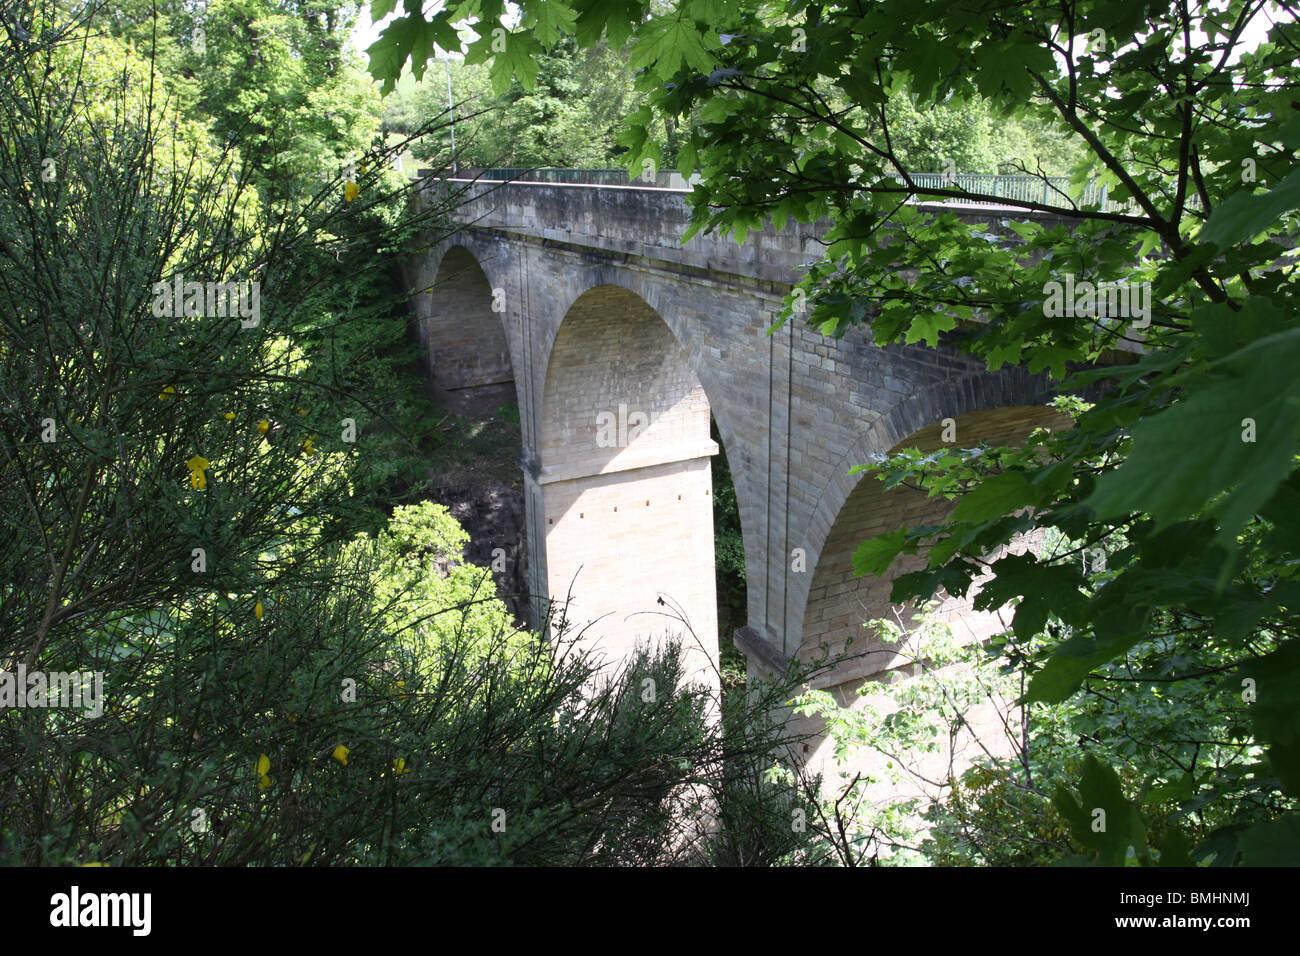 Cartland Bridge on the A73 South Lanarkshire Scotland  June 2010 - Stock Image